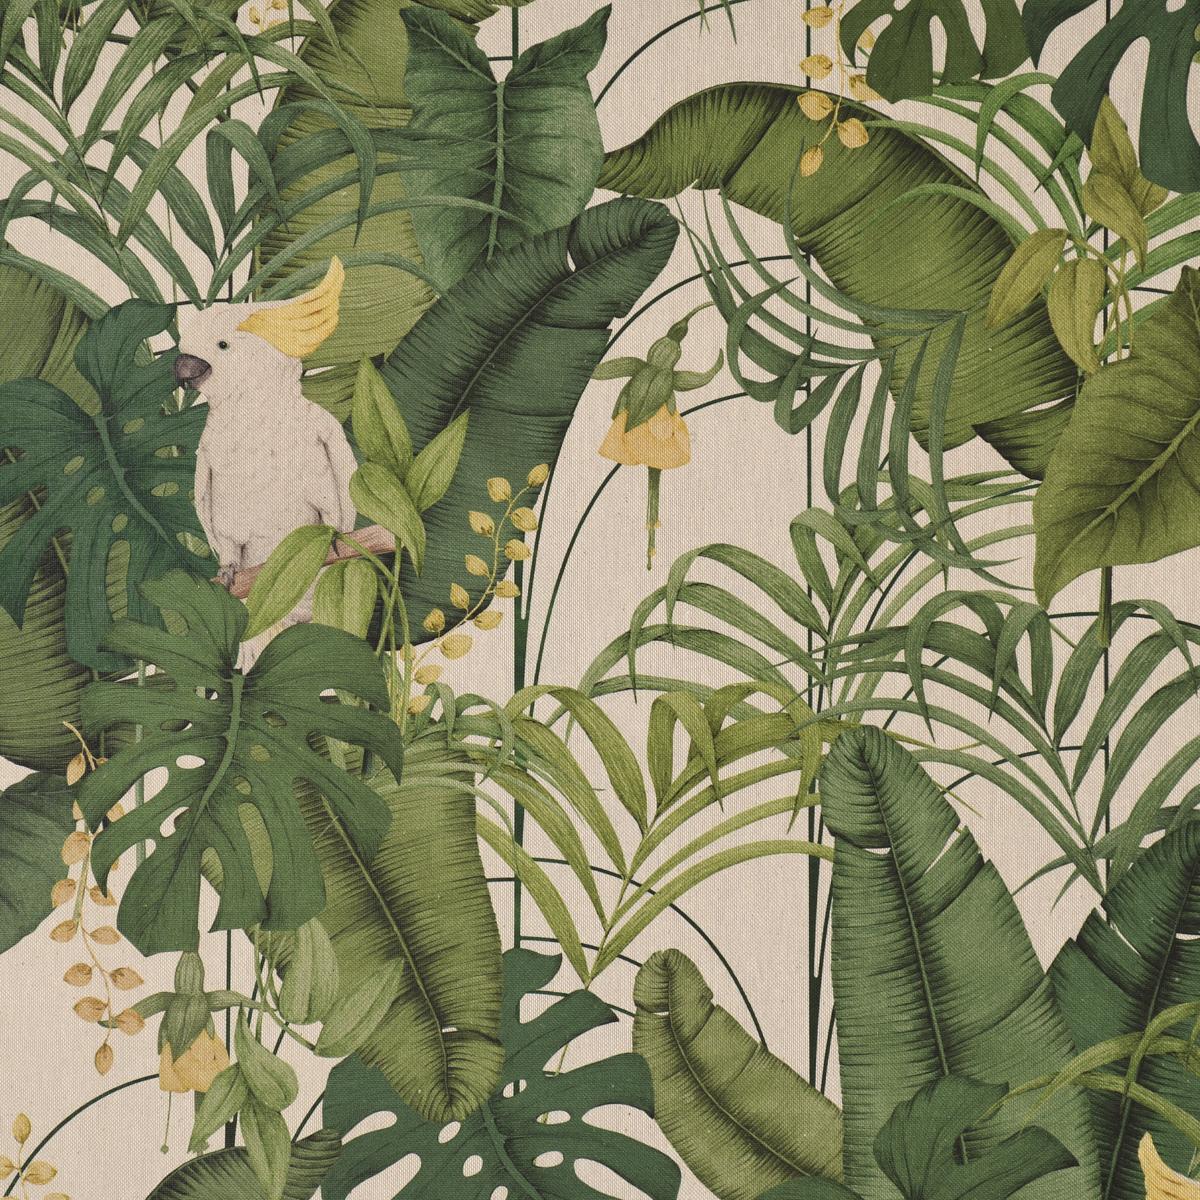 Dekostoff Halbpanama Leinenlook Royal Cockatoo Palmenblätter Kakadus natur grün gelb 1,40m Breite